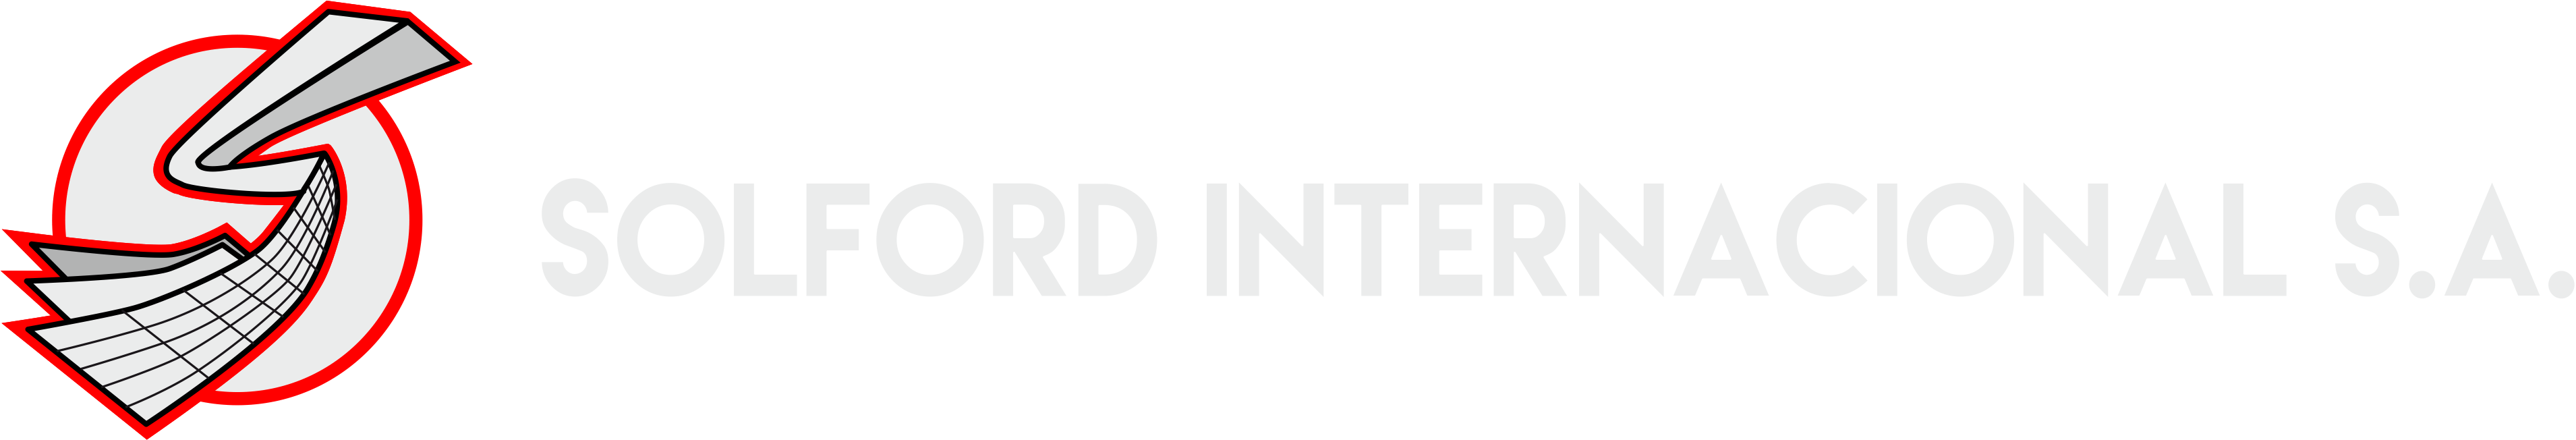 Solford International